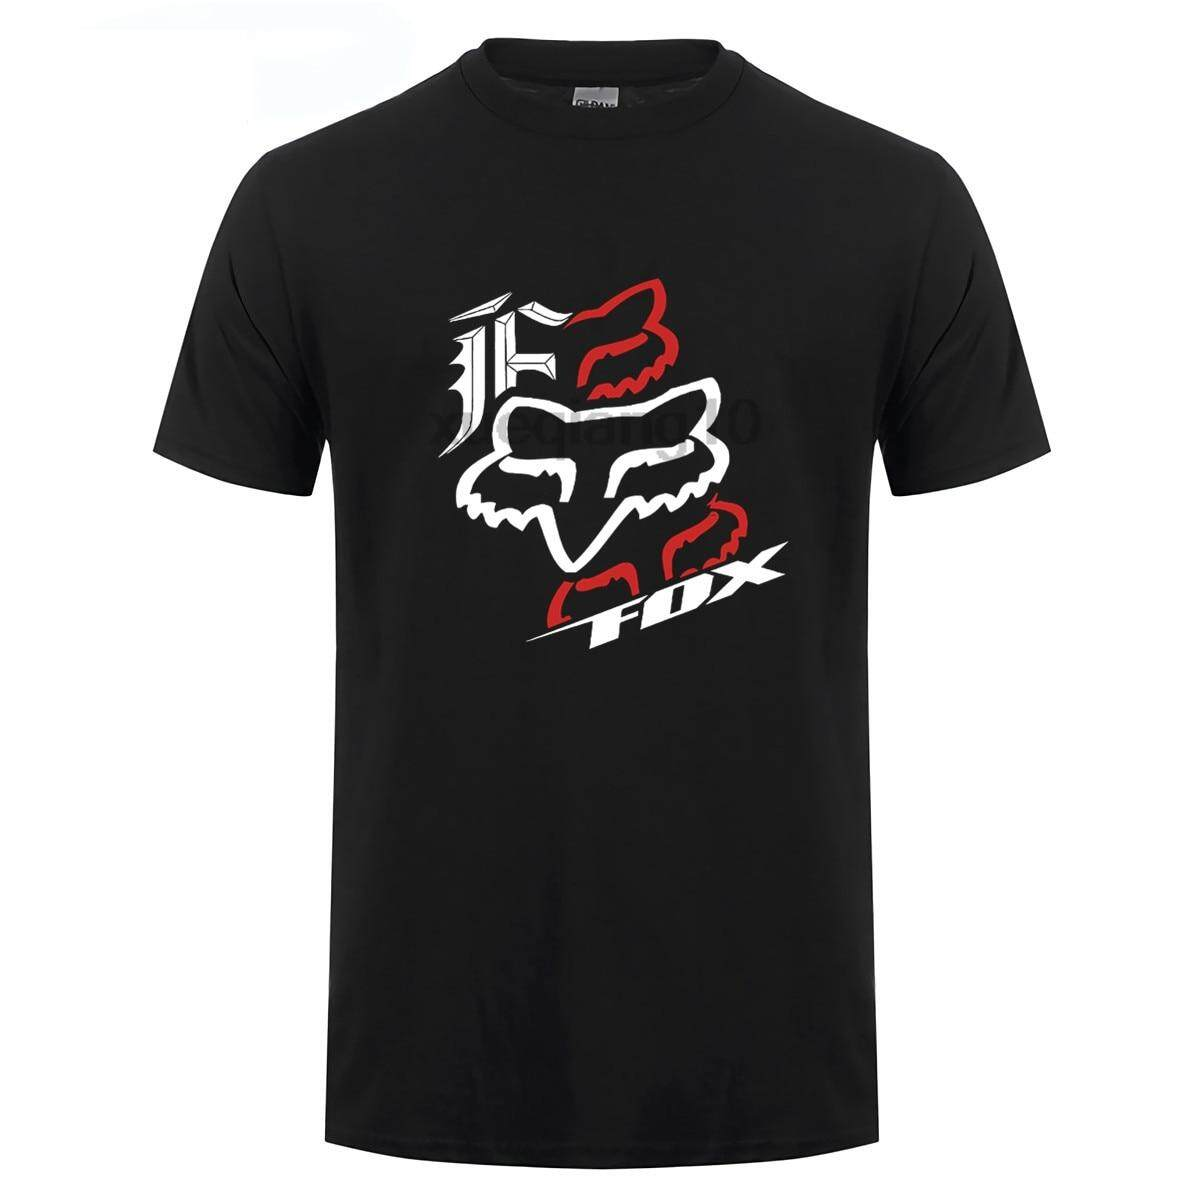 2018 best sell tshirt fox racing t-shirt logo clothing desktop wallpaper